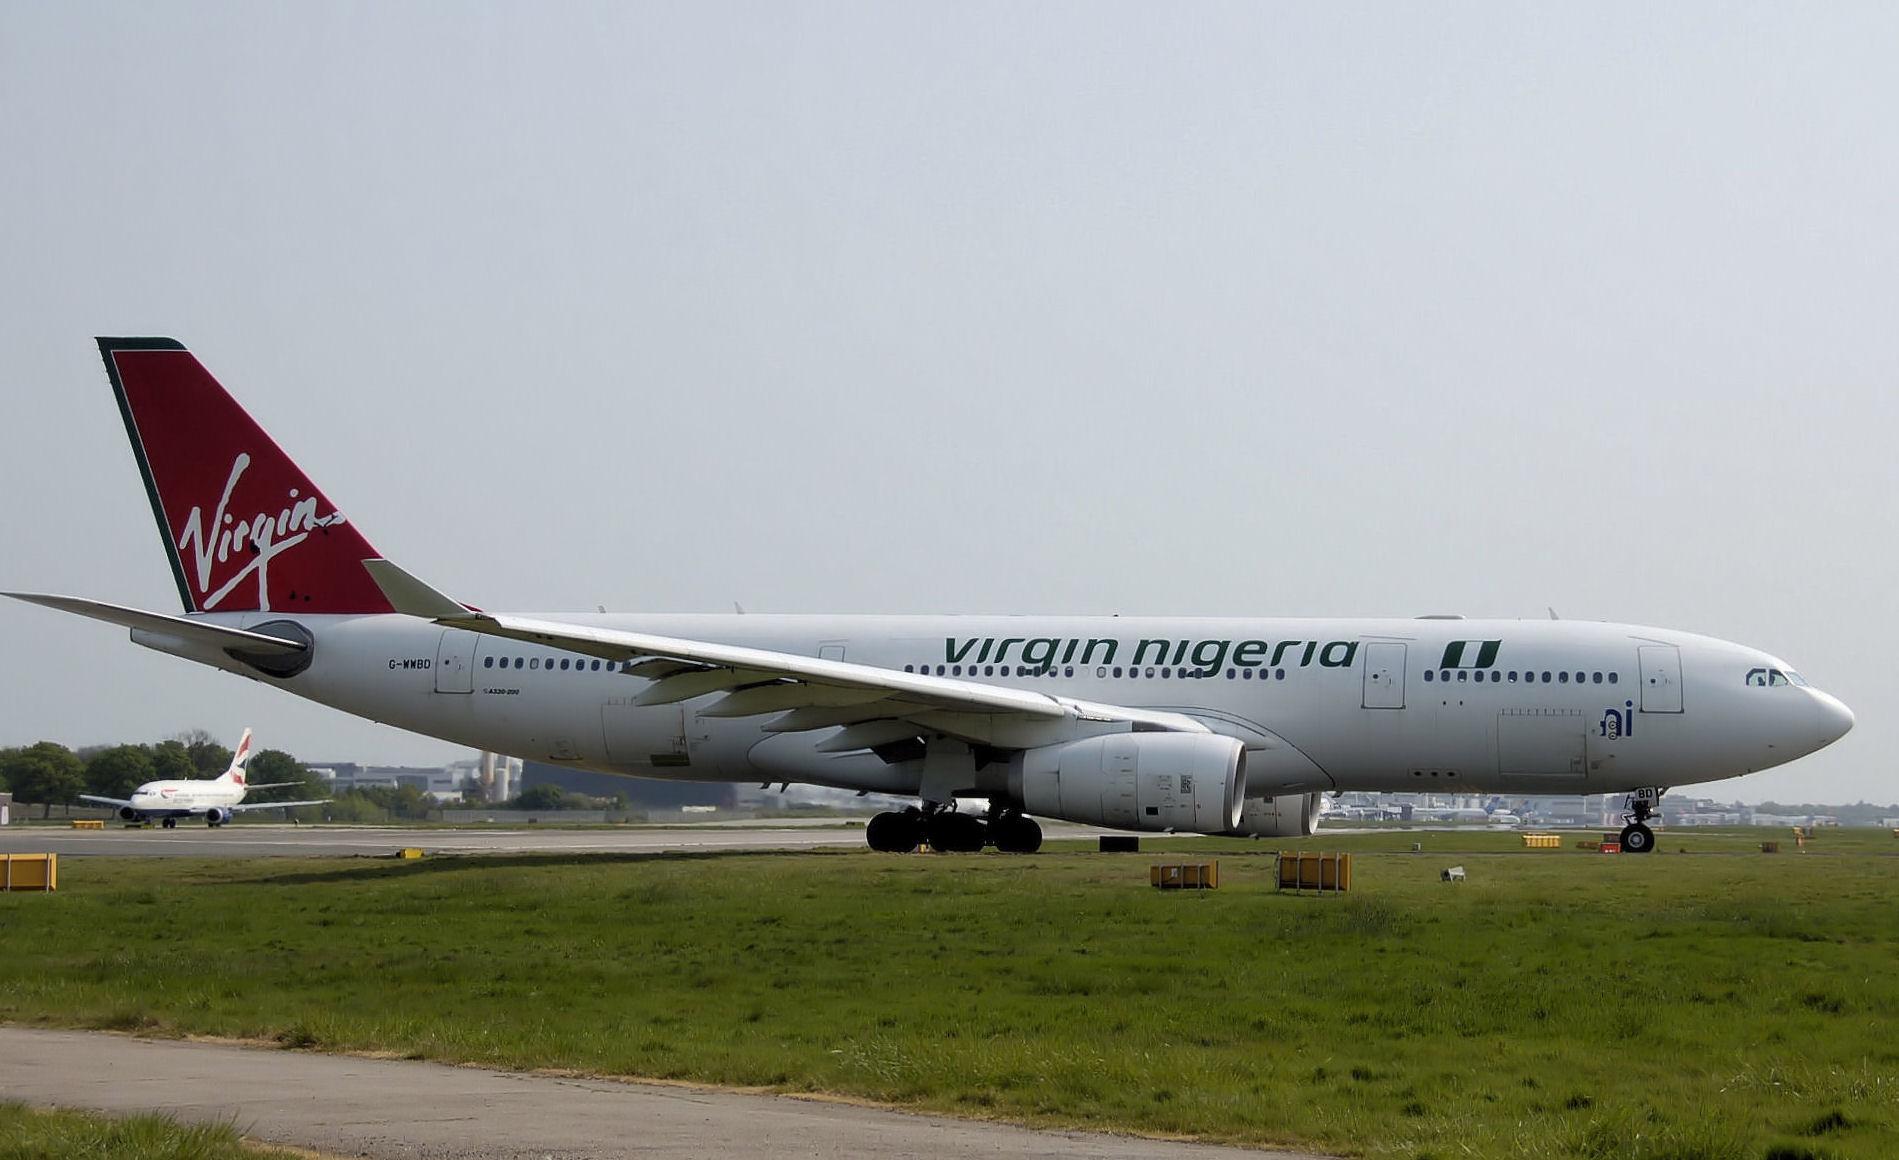 Airlines british virgin islands